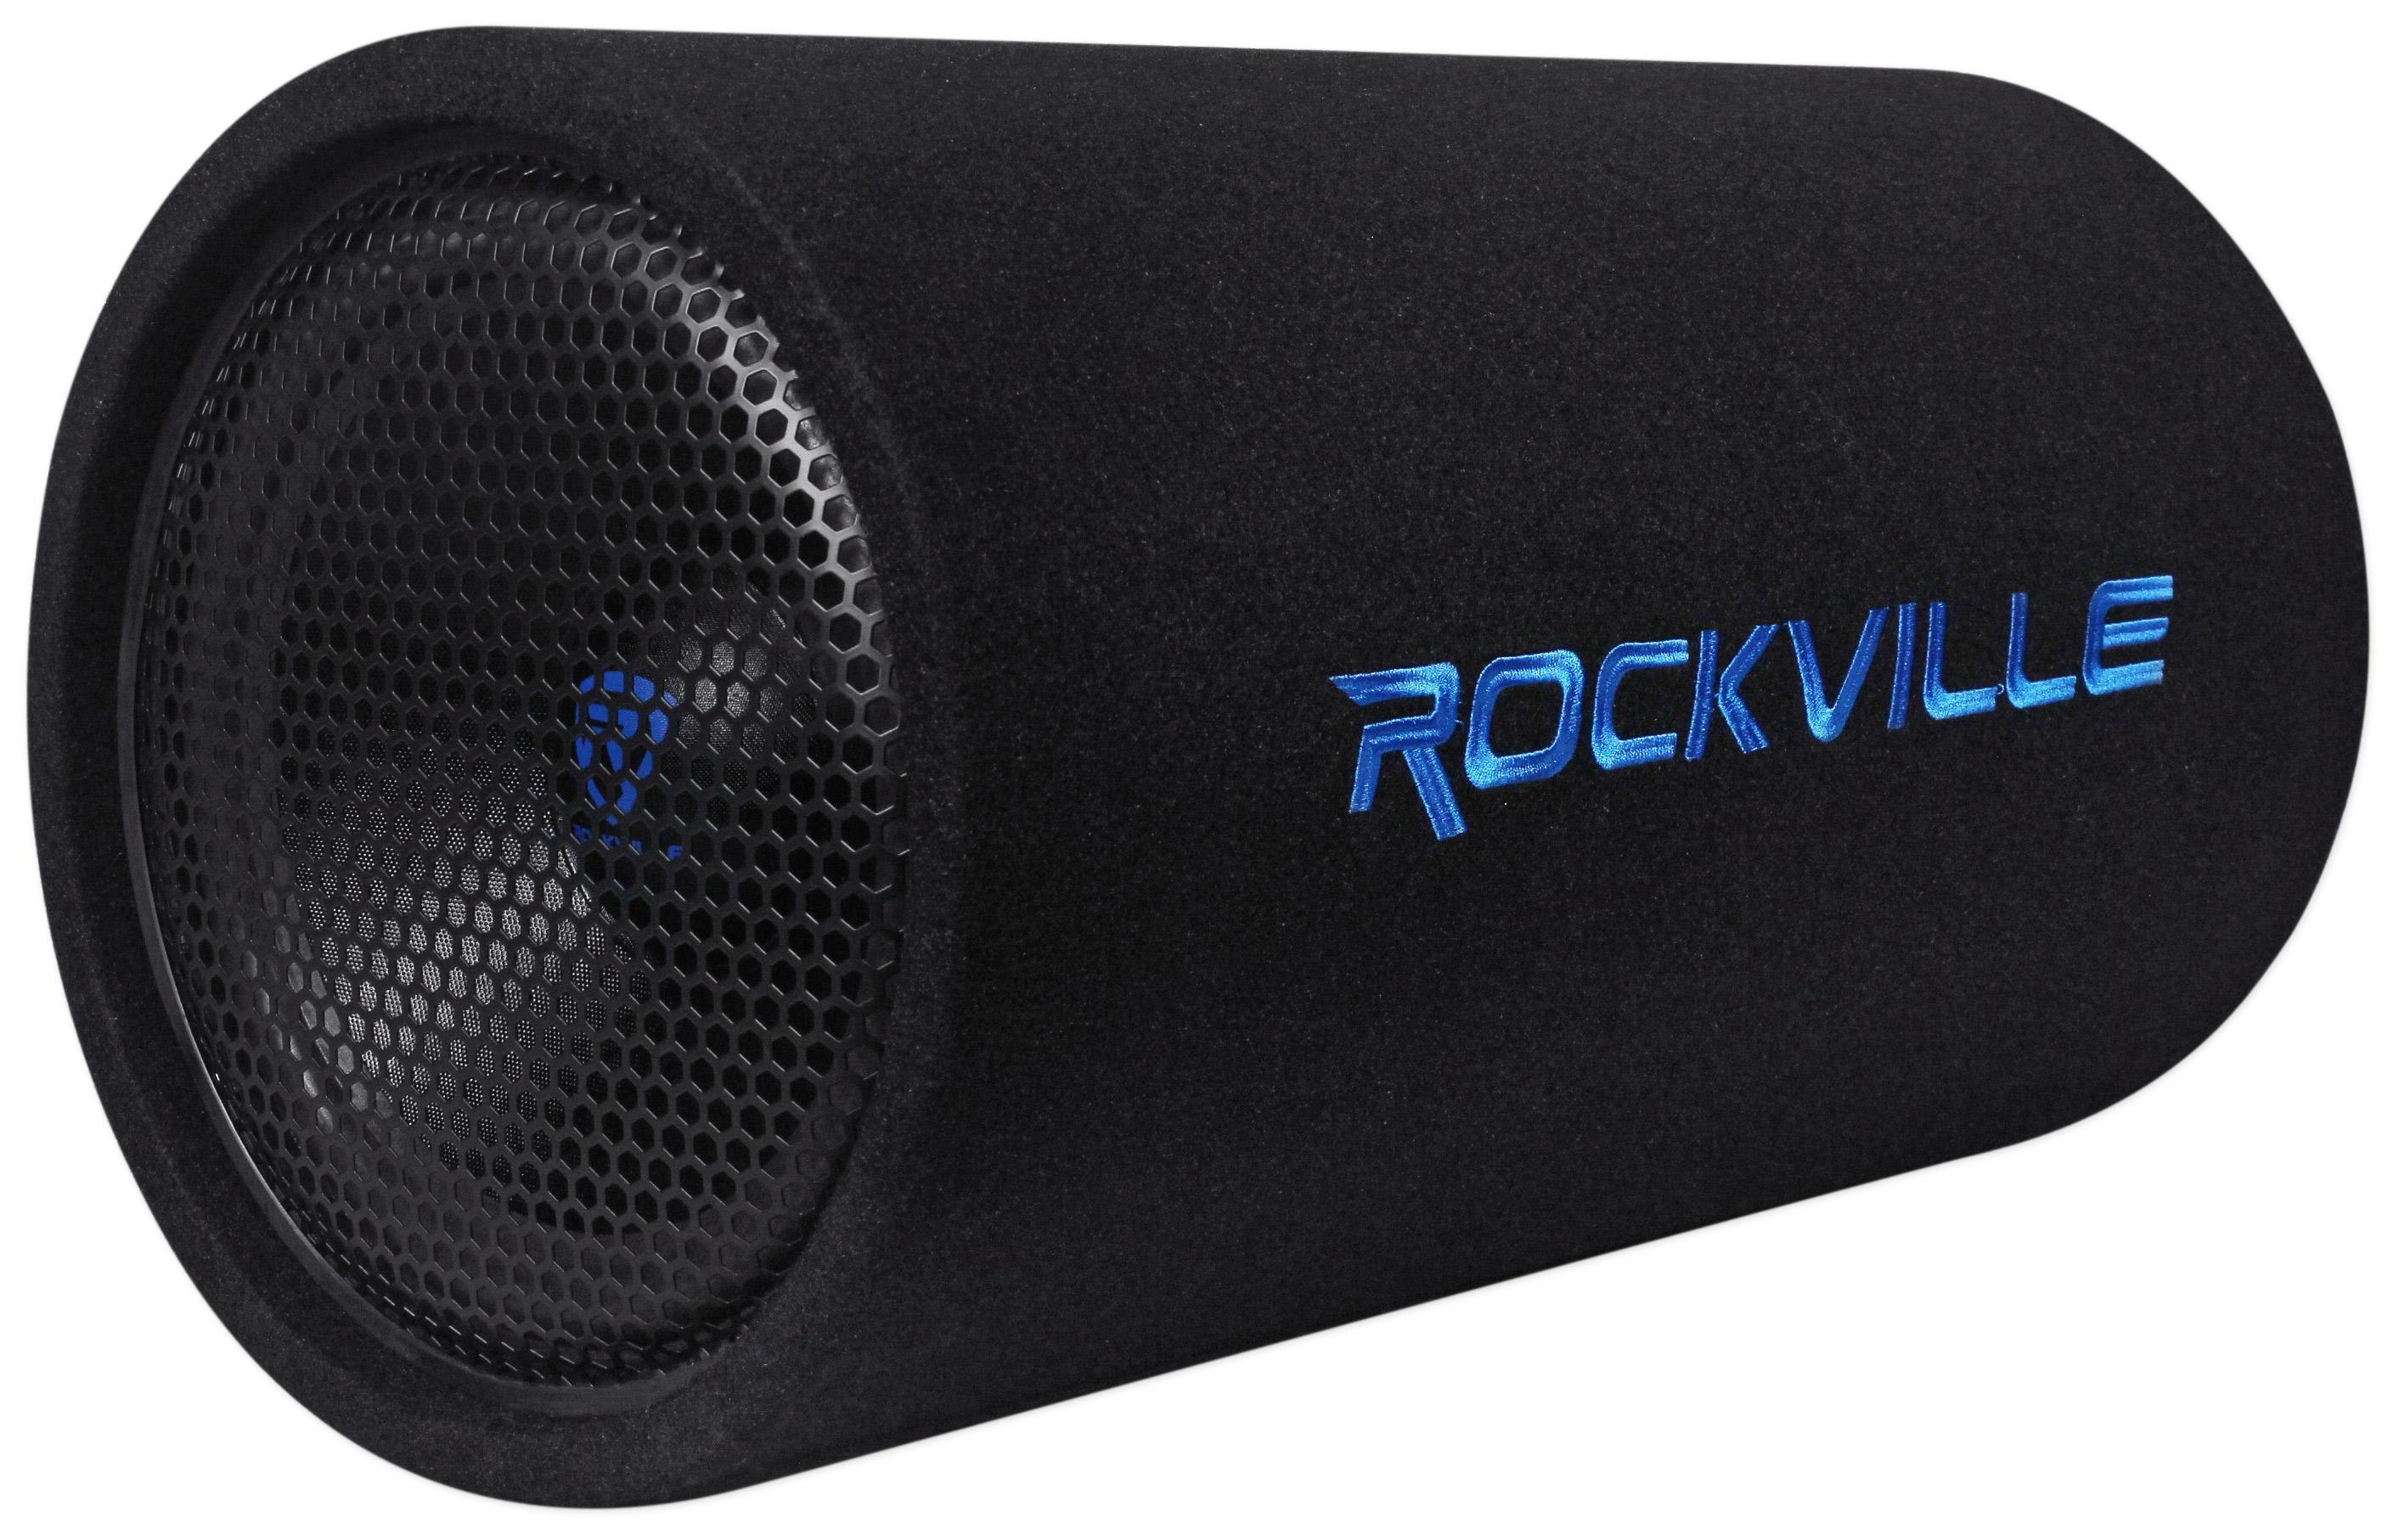 "Amazon.com: Rockville RTB12A 12"" 600w Powered Subwoofer"